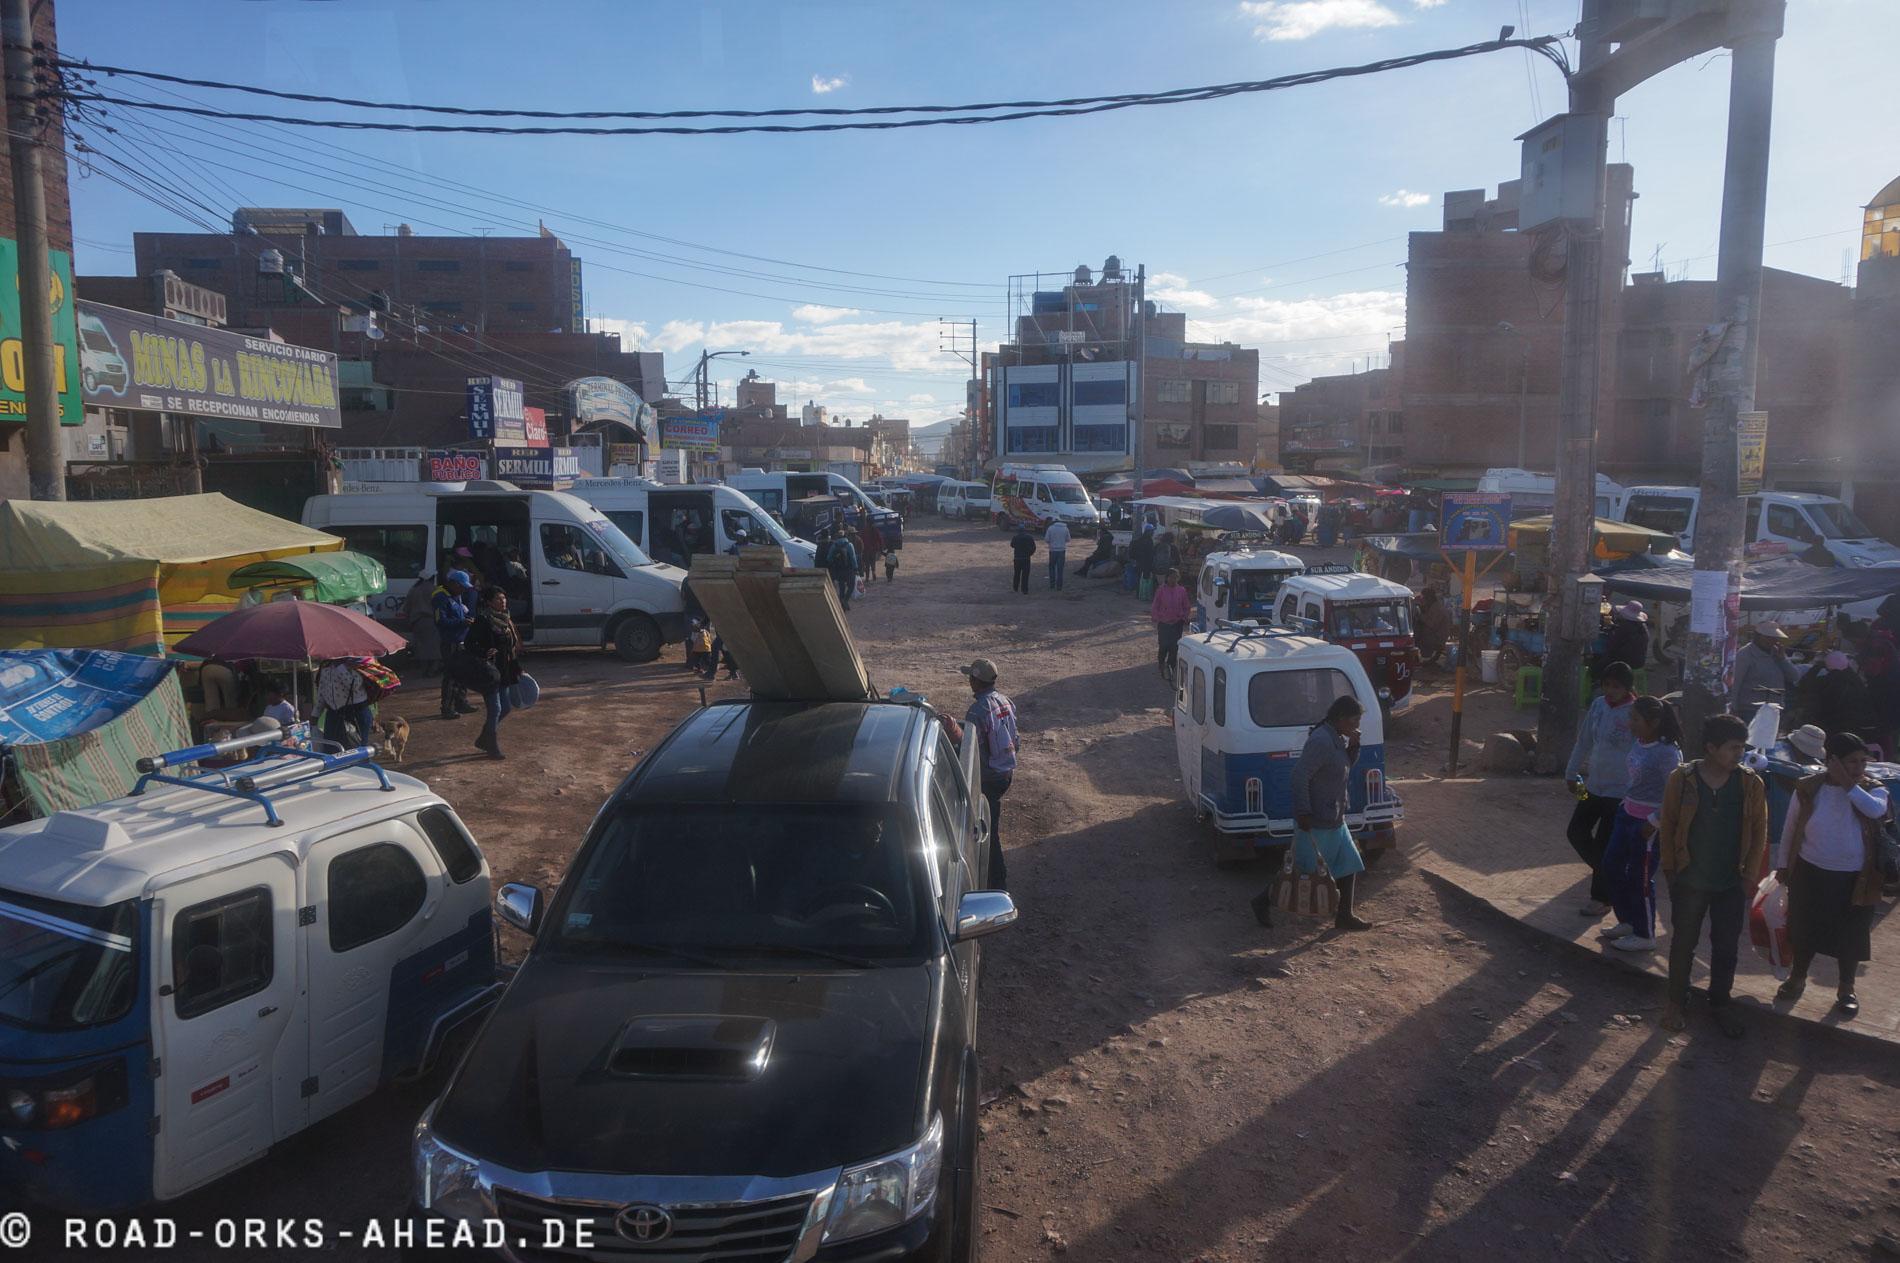 Südamerikanisches Chaos, ähhm Ordnung